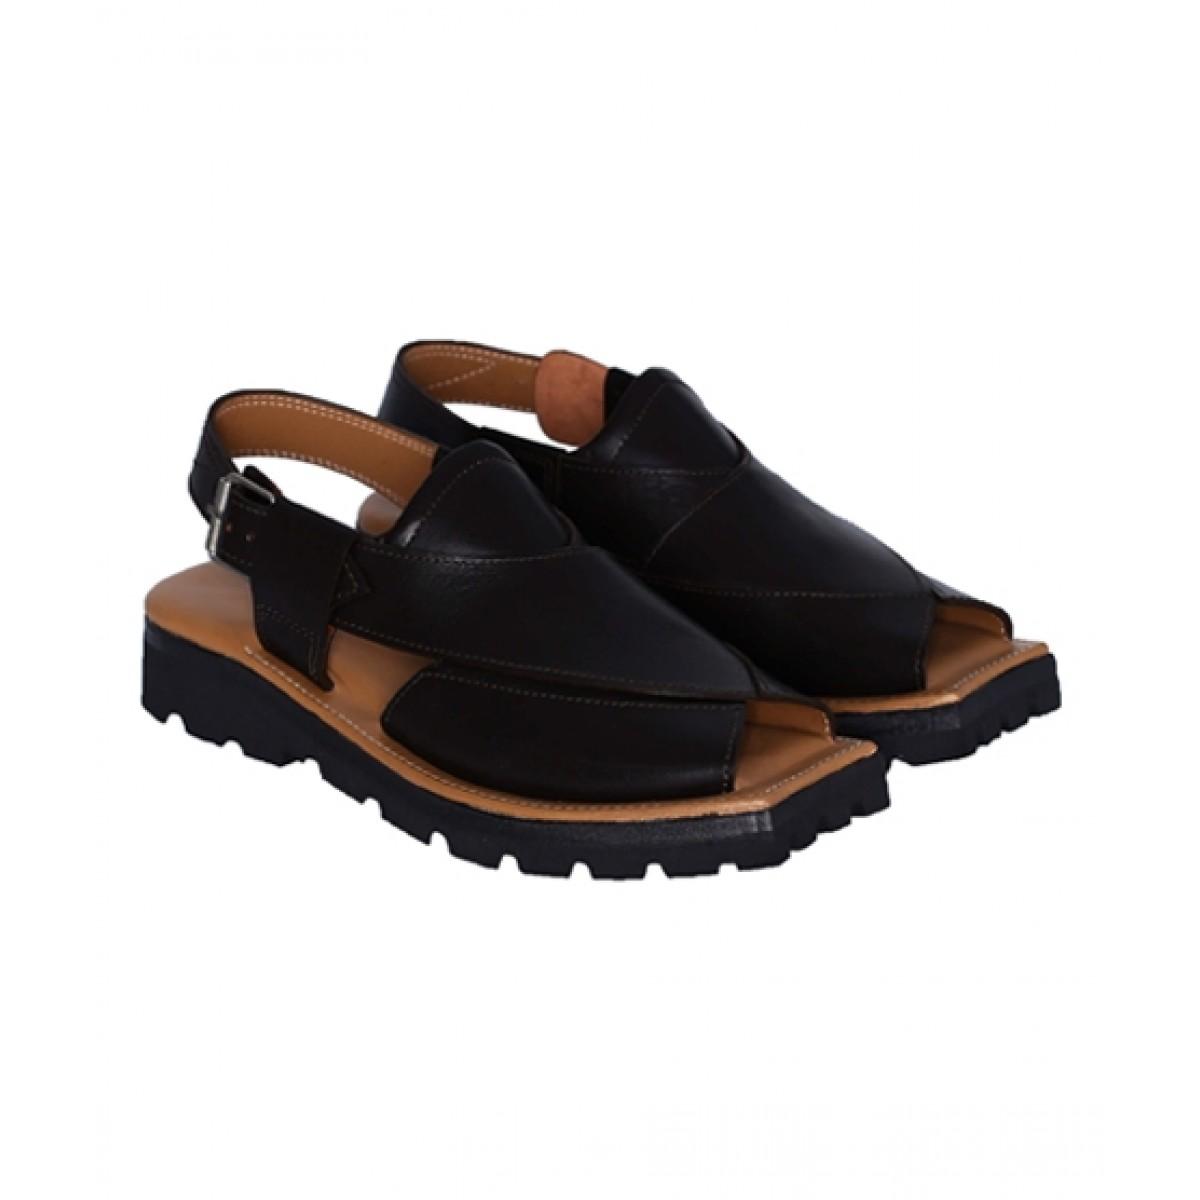 NOVADO Kaptaan Leather Peshawari Sandal For Men Choco Brown (0043)